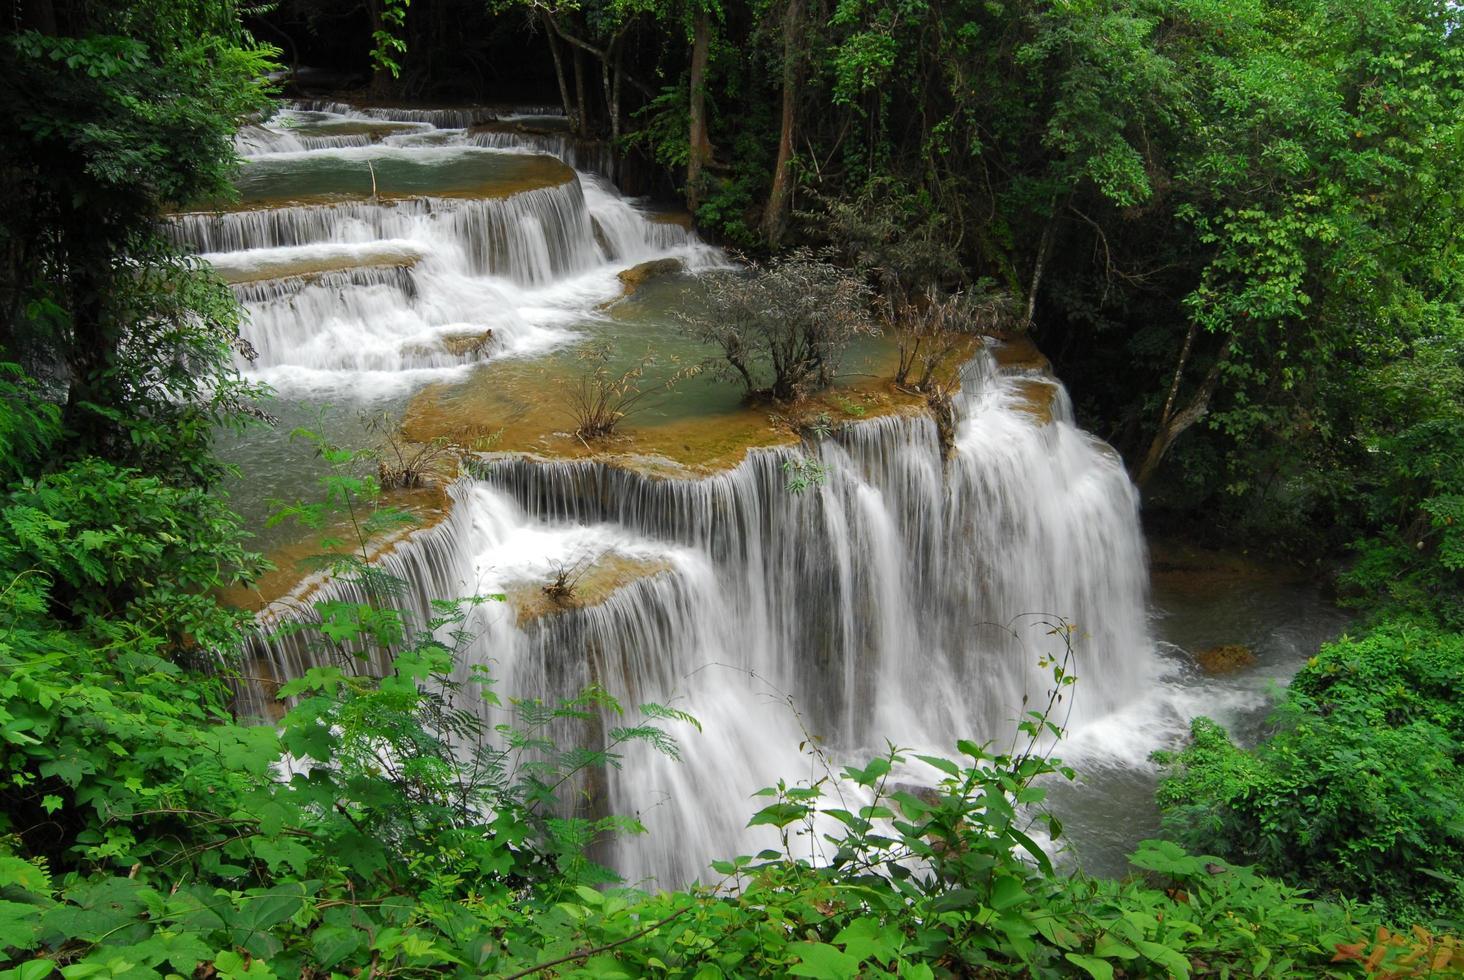 Cascade de huay mae kamin dans le parc national de khuean srinagarindra, province de kanchanaburi, thaïlande photo